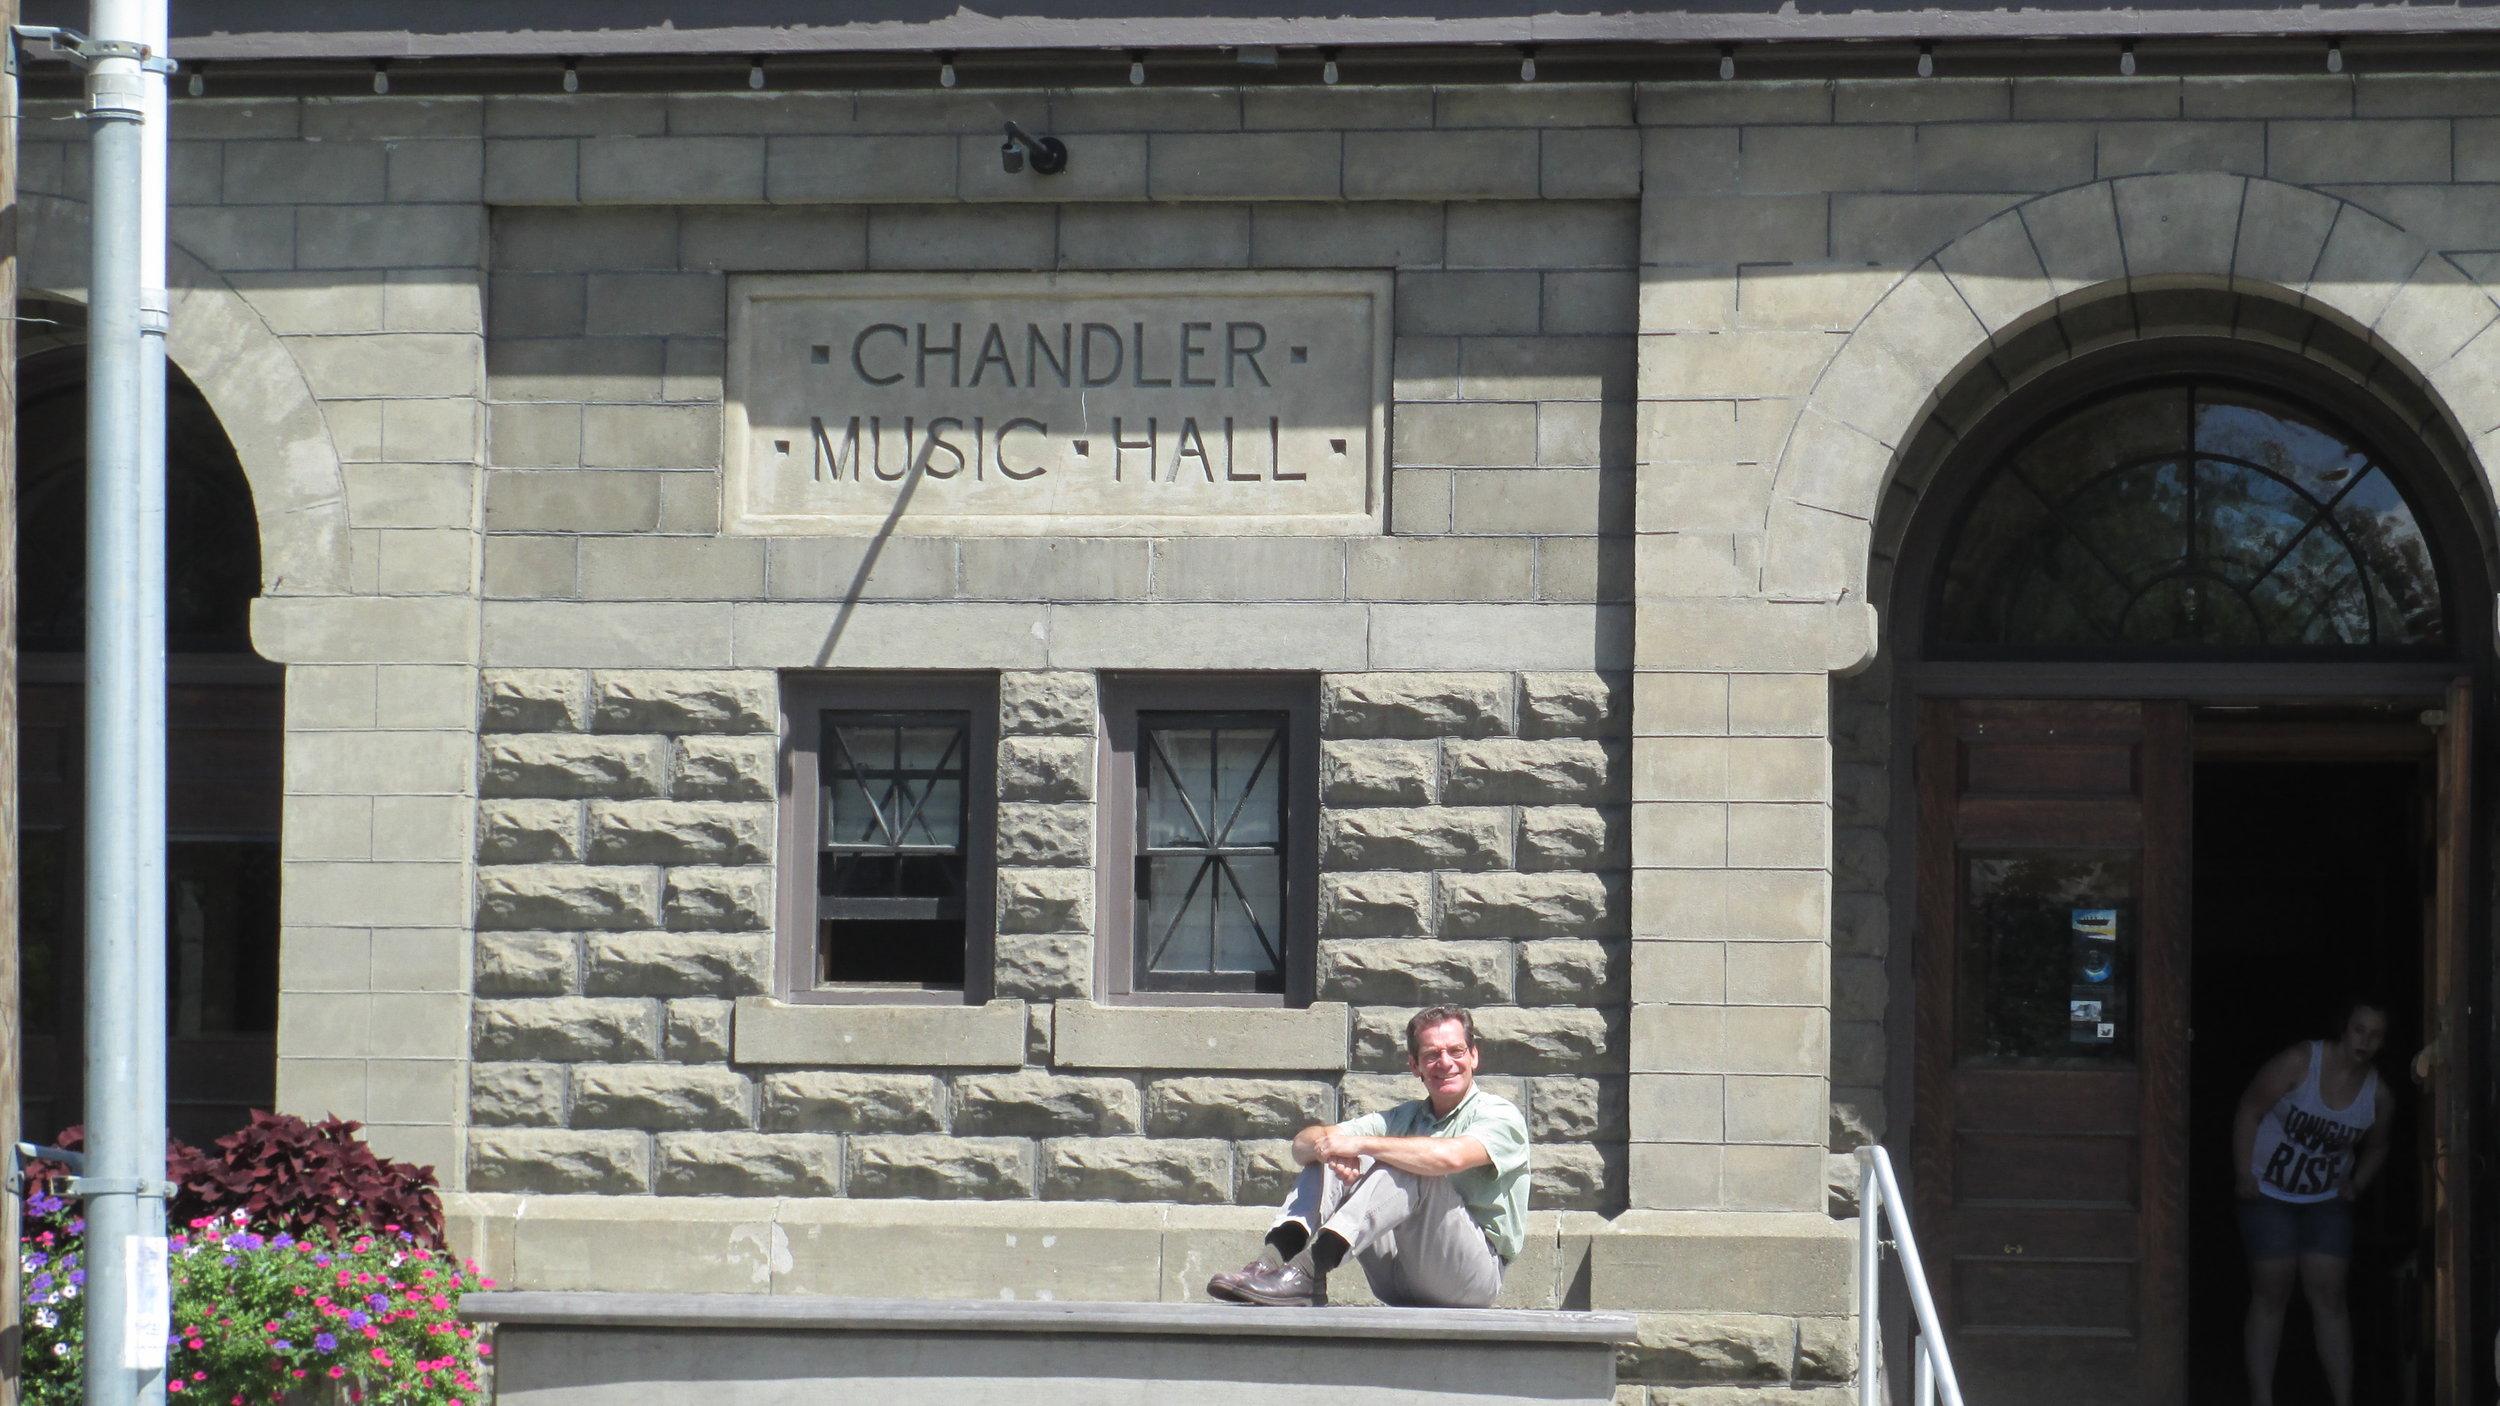 Chandler Music Hall 007.JPG